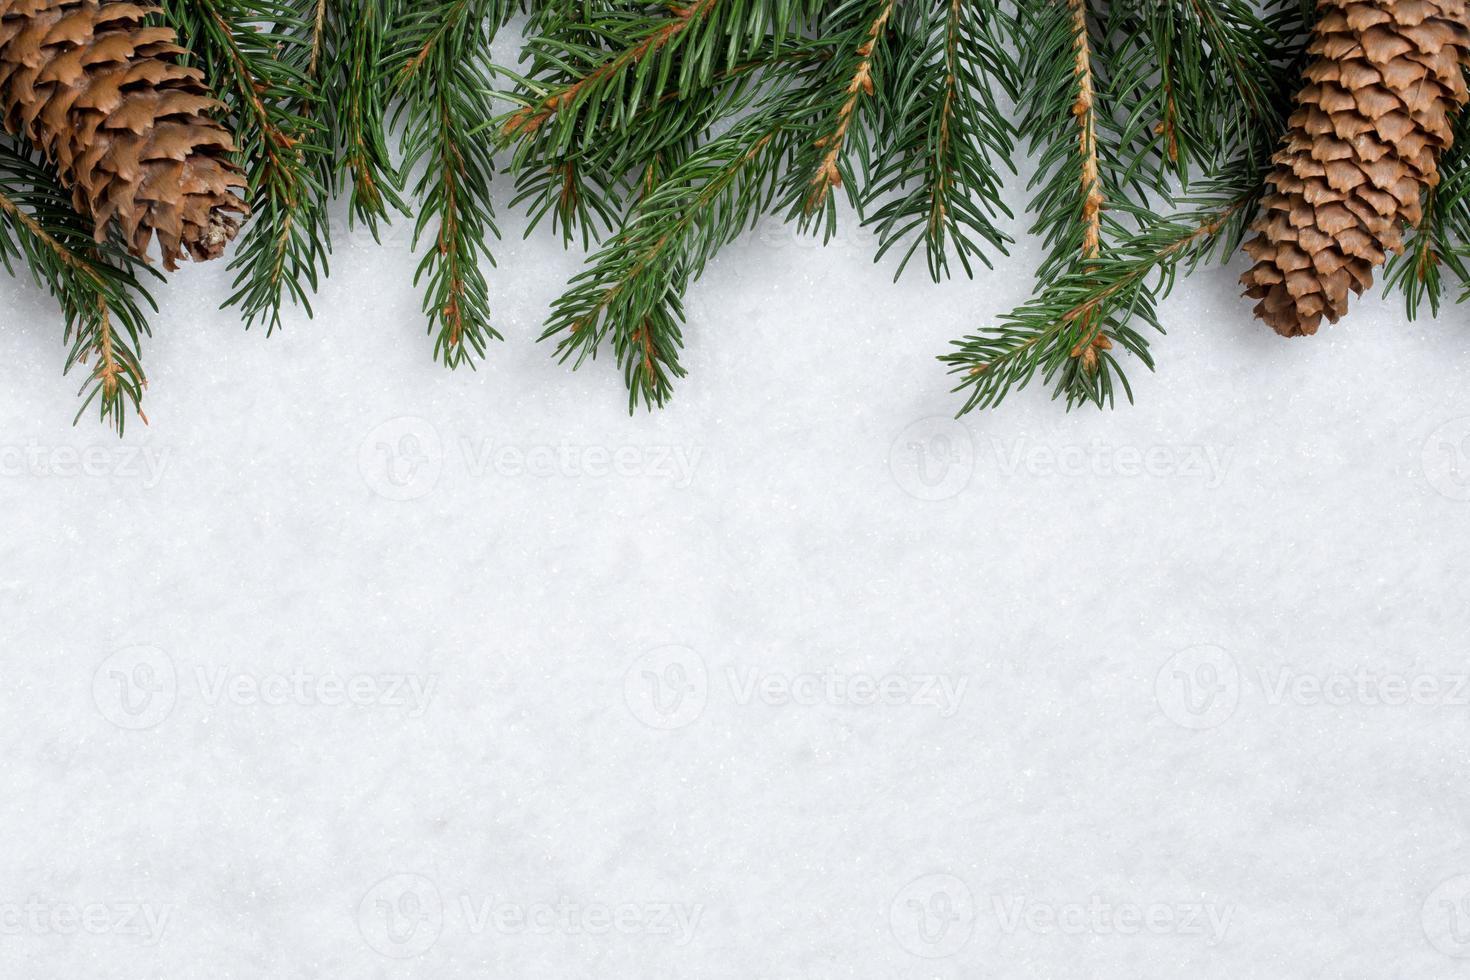 Kerst achtergrond met fir takken, kegels en sneeuw foto